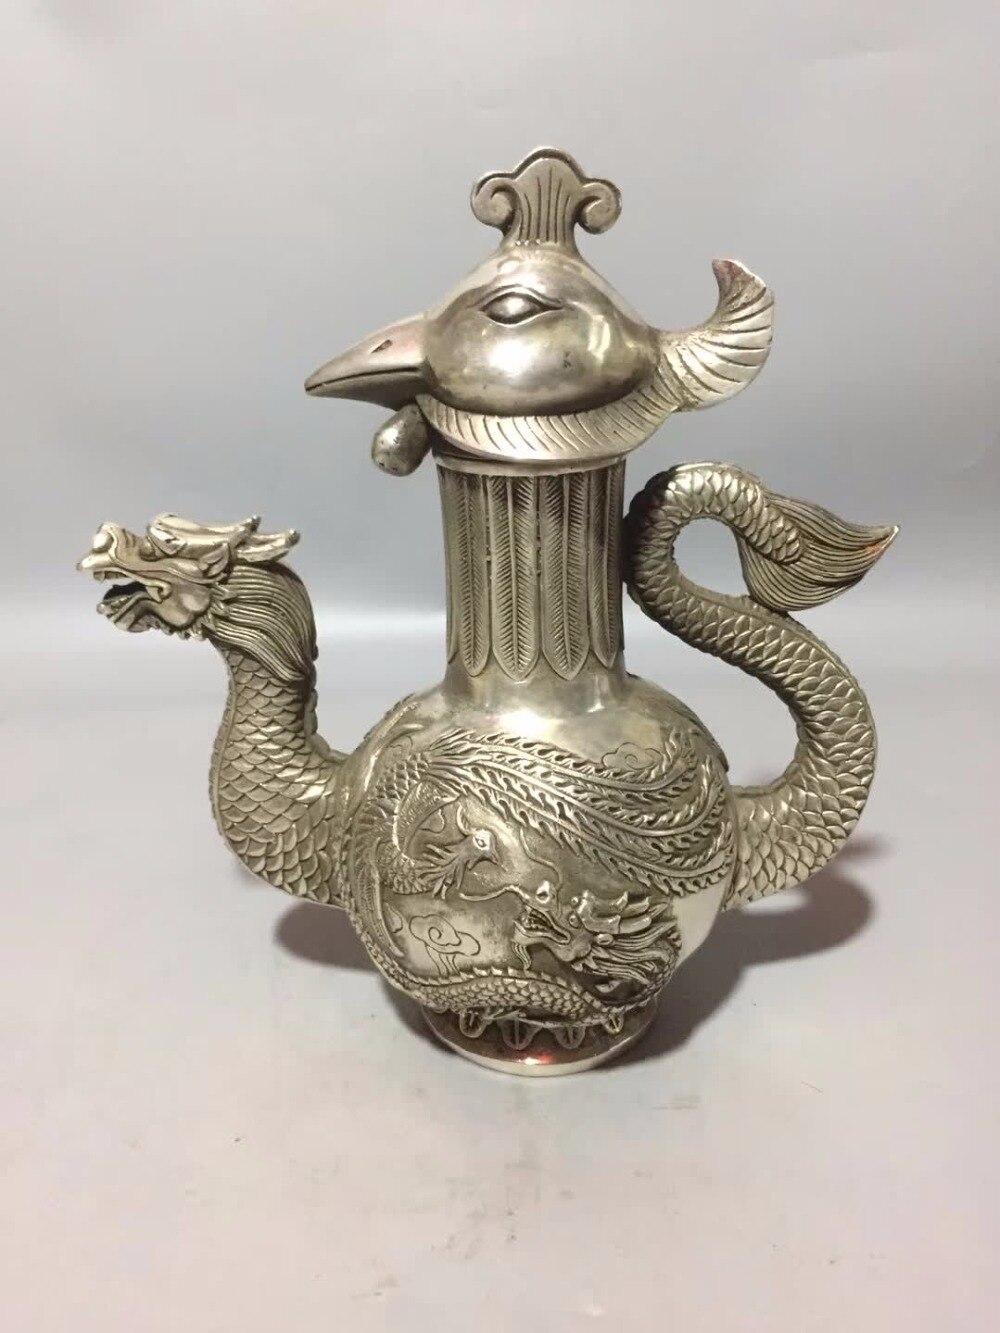 Home/desk Decoration Teapot Crafts,art Collection Tibet Silver Old Handmade Carving Dragon Phoenix Pot/chinese Antique Tea Pot Ornaments Bottles, Jars & Boxes